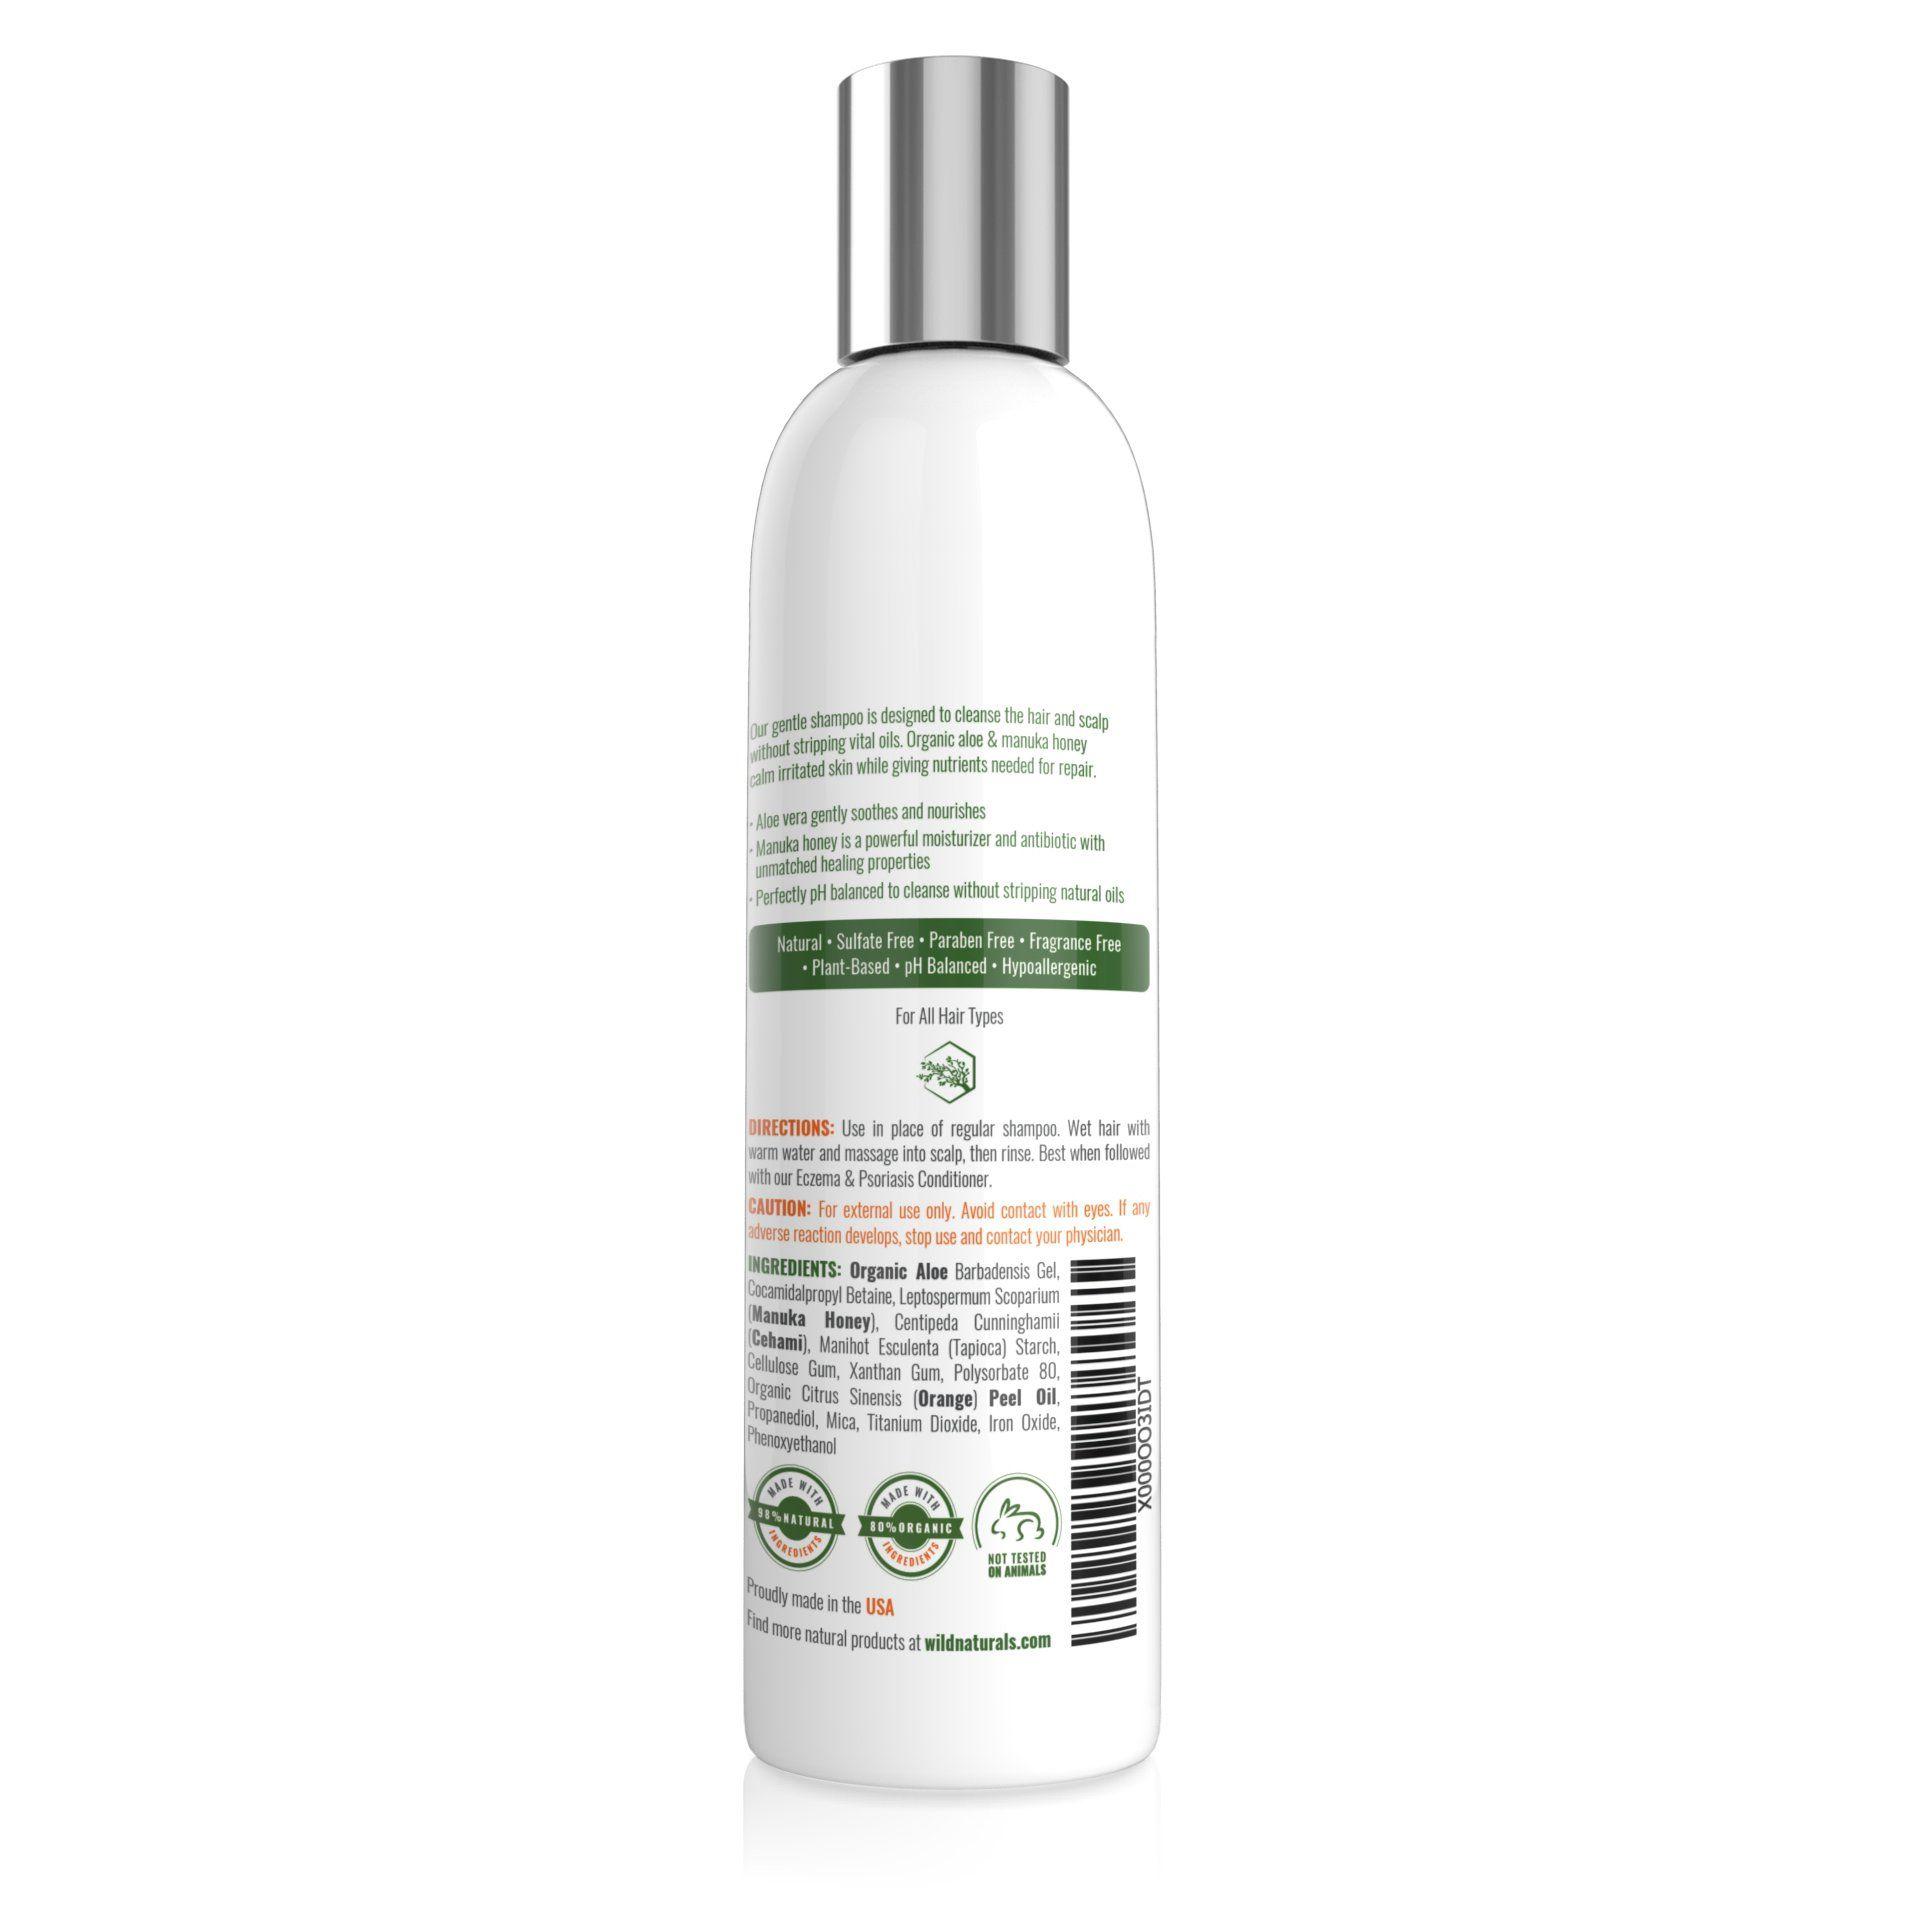 Wild Naturals Eczema Shampooideas Soap For Sensitive Skin Dry Scalp Treatment Eczema Psoriasis